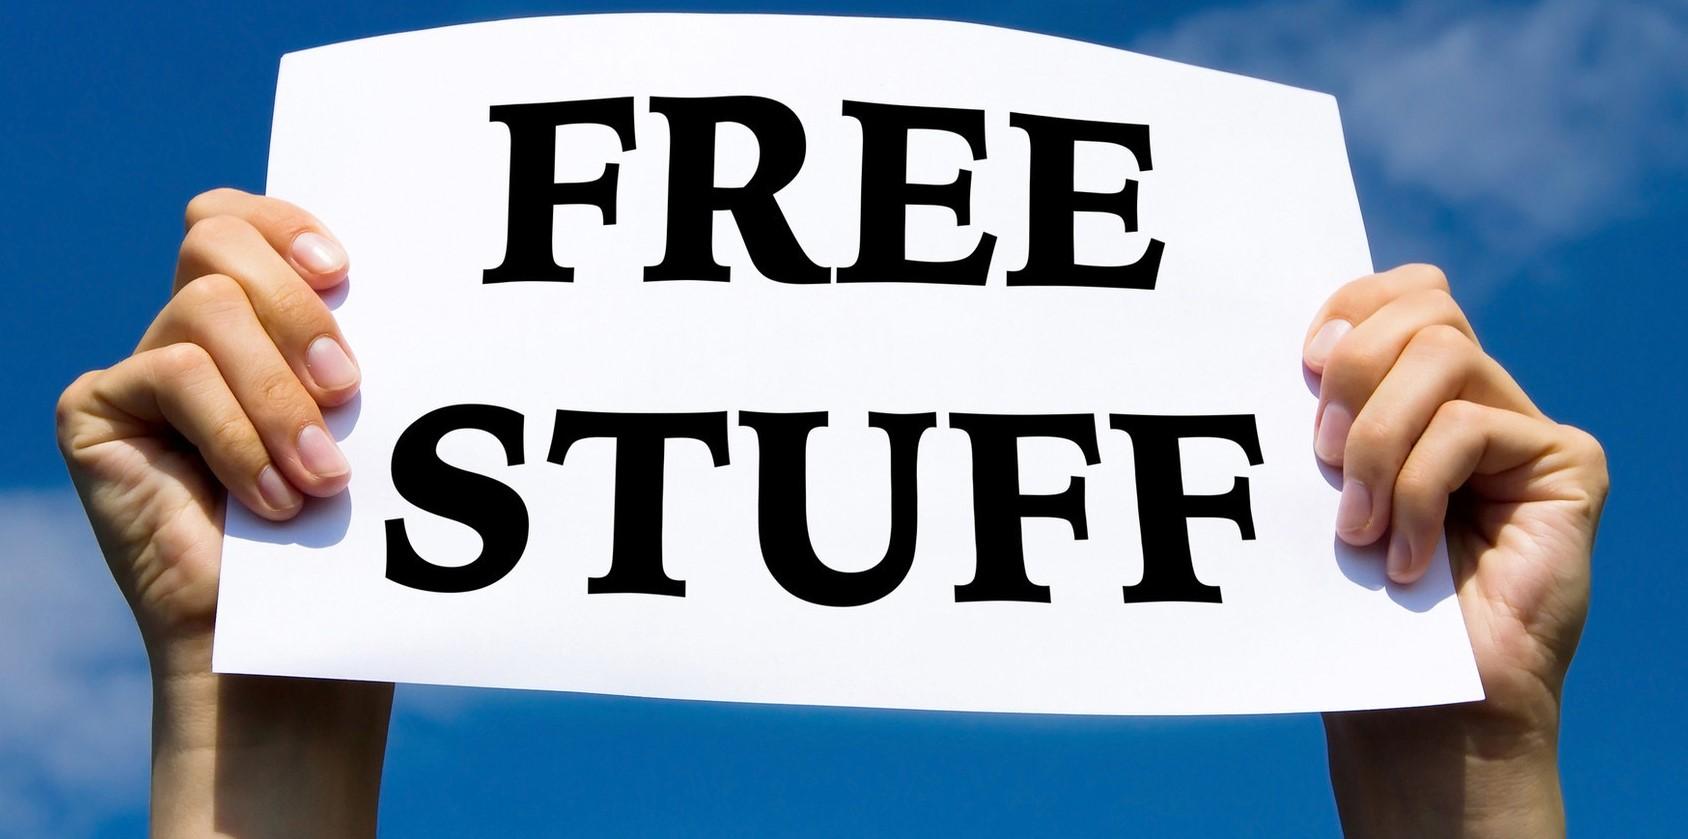 freestuff3.jpg